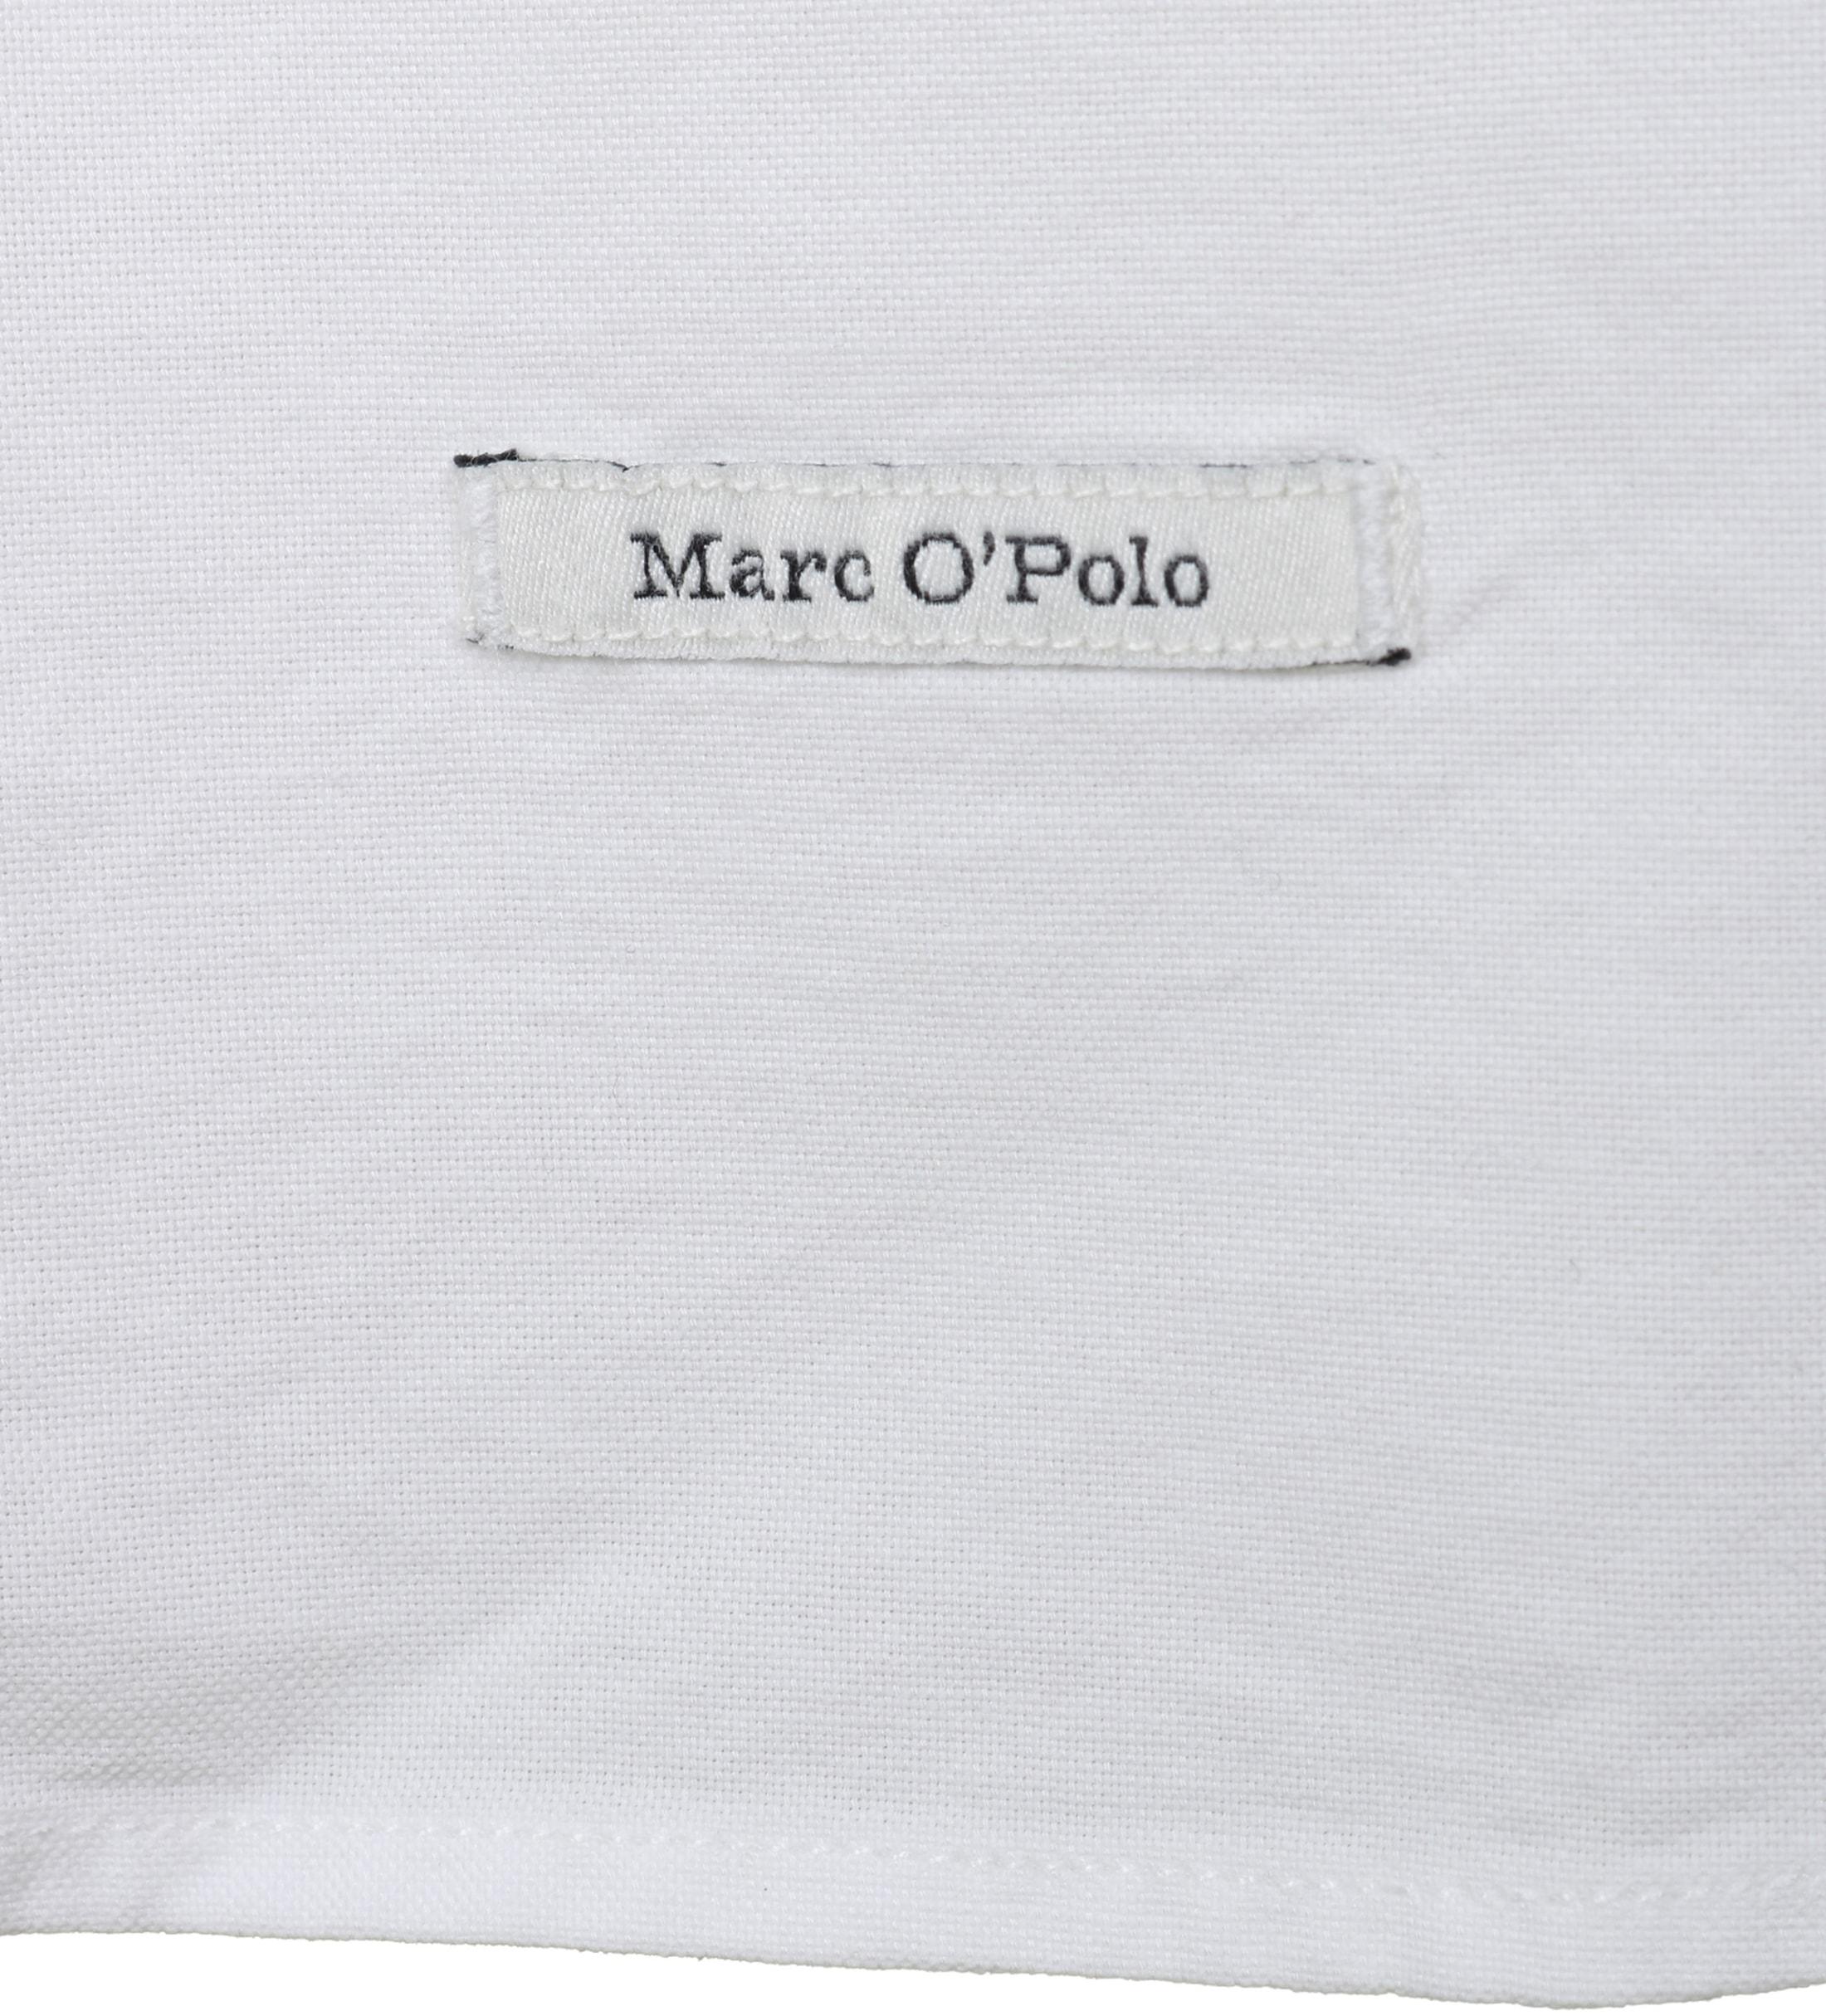 Marc O'Polo Overhemd Wit foto 2